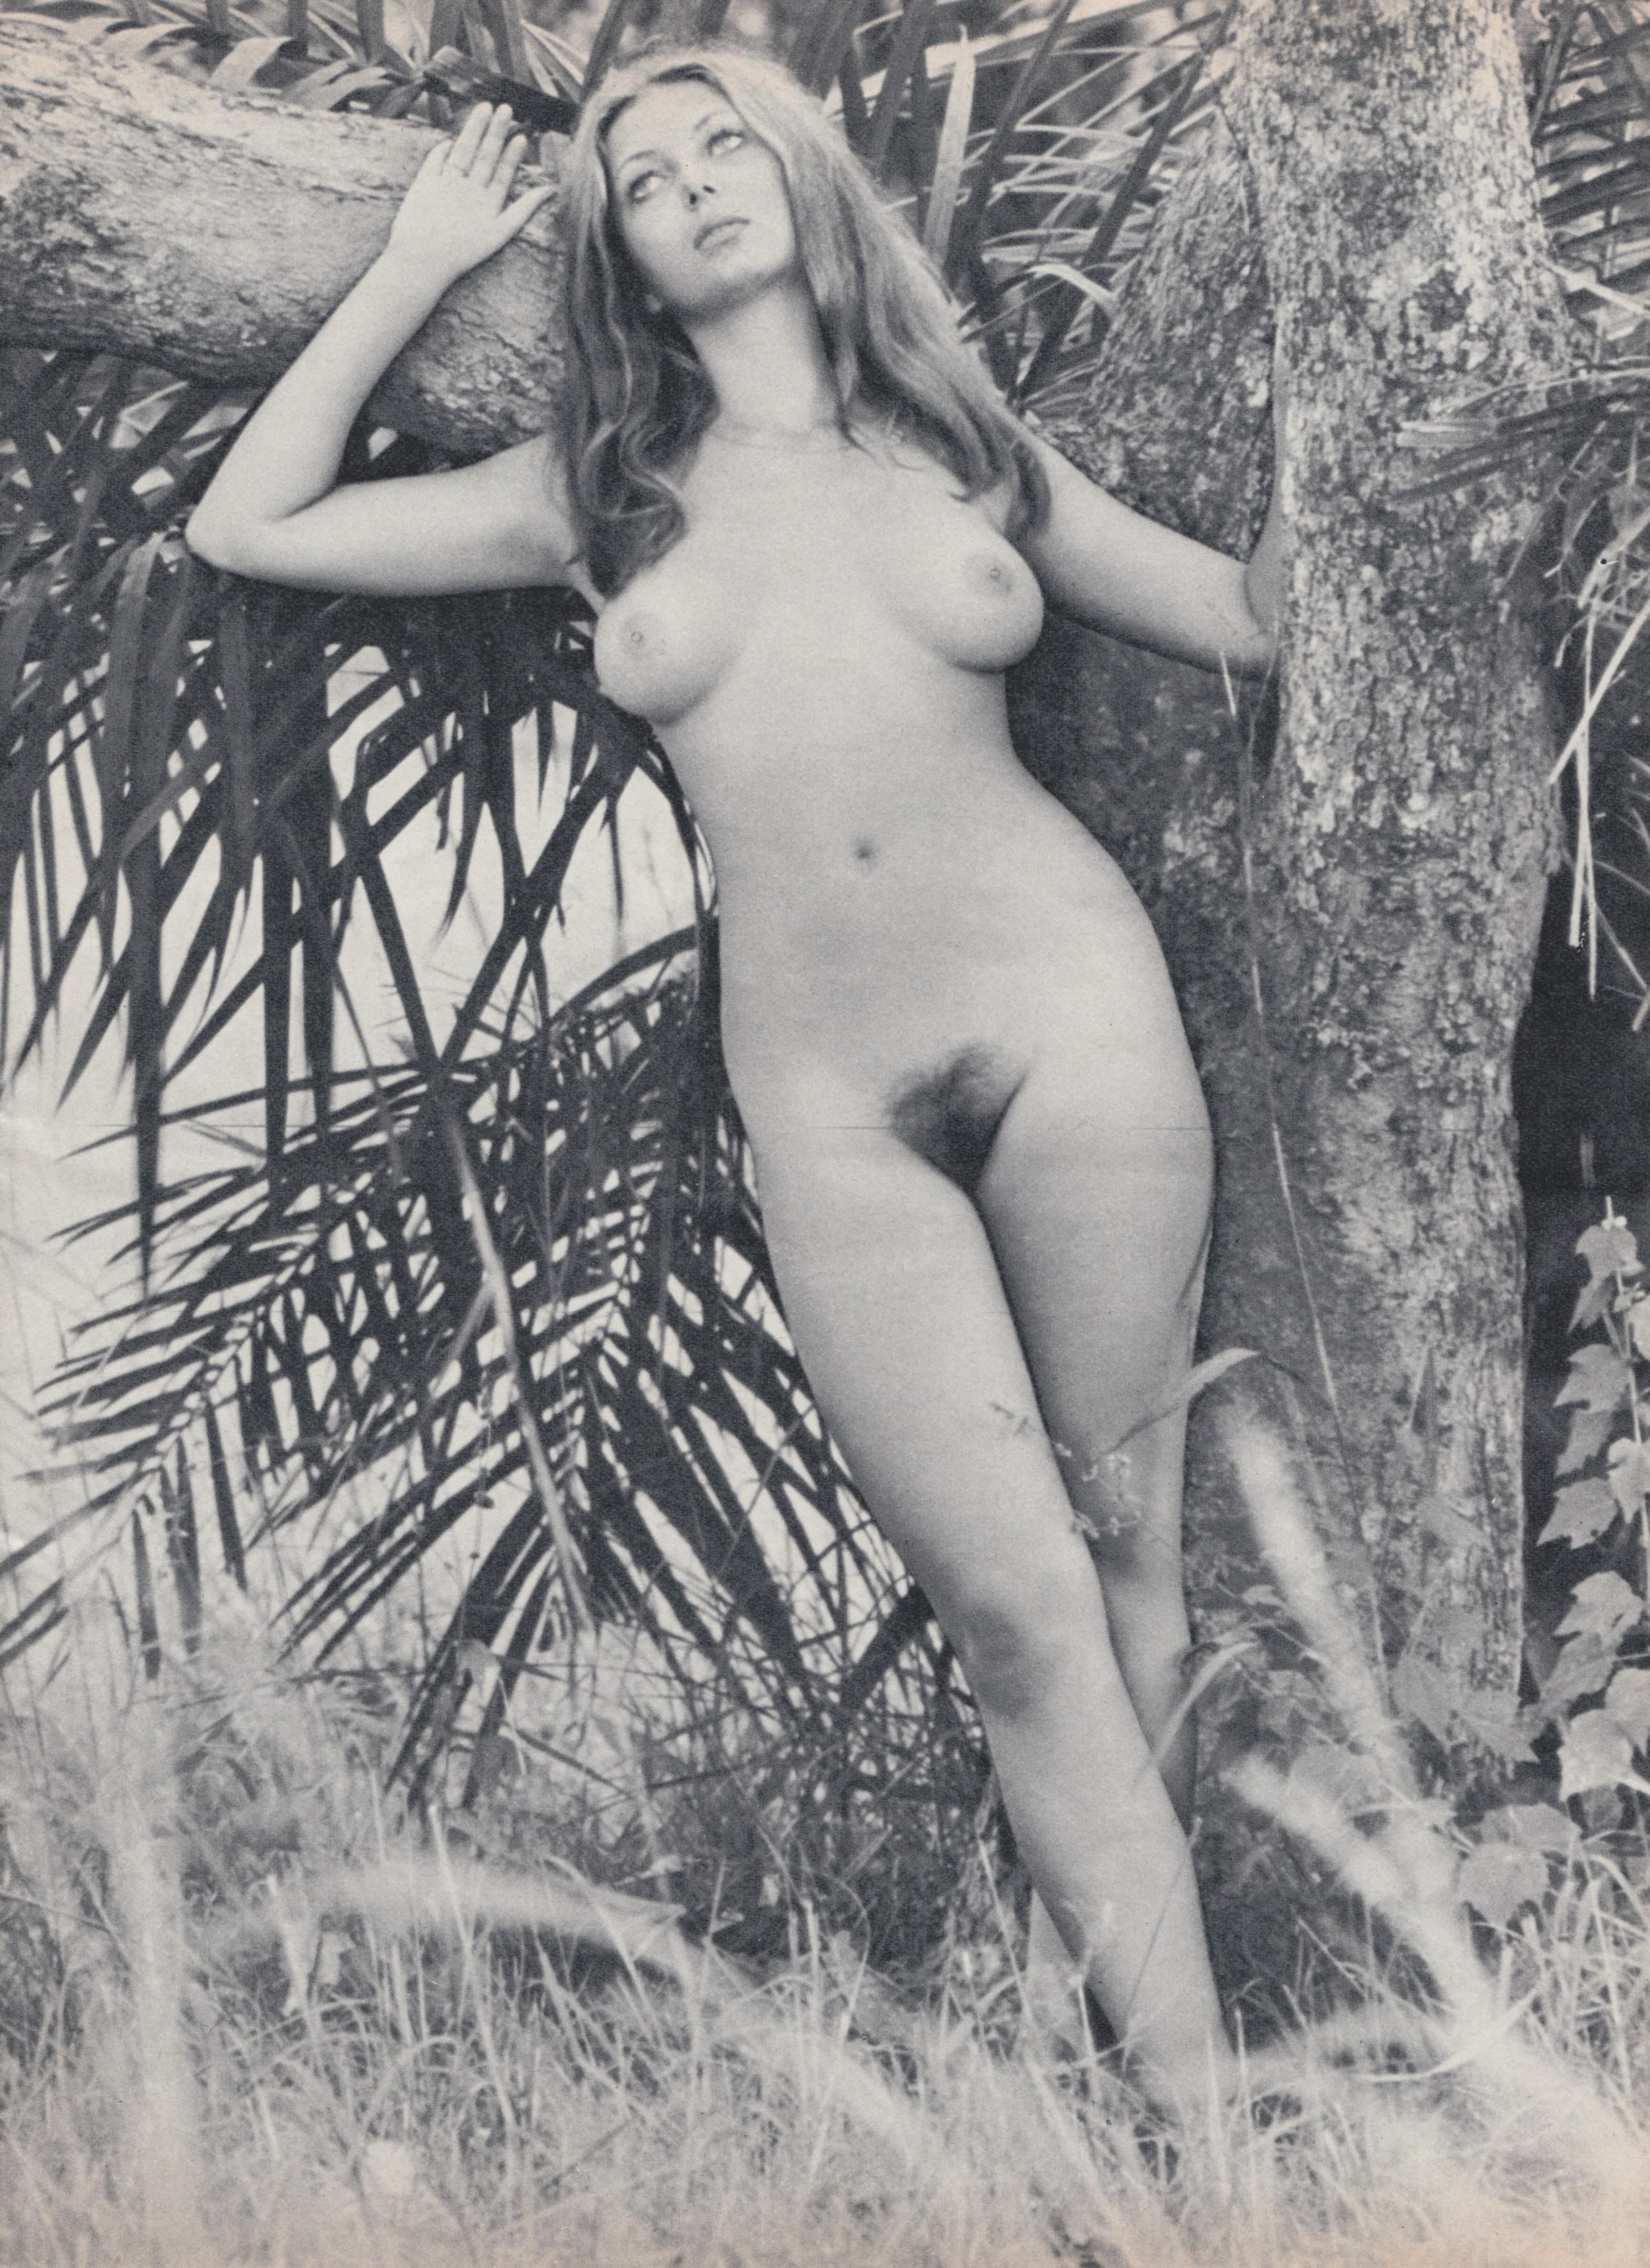 Фото эротика 70 х 2 фотография